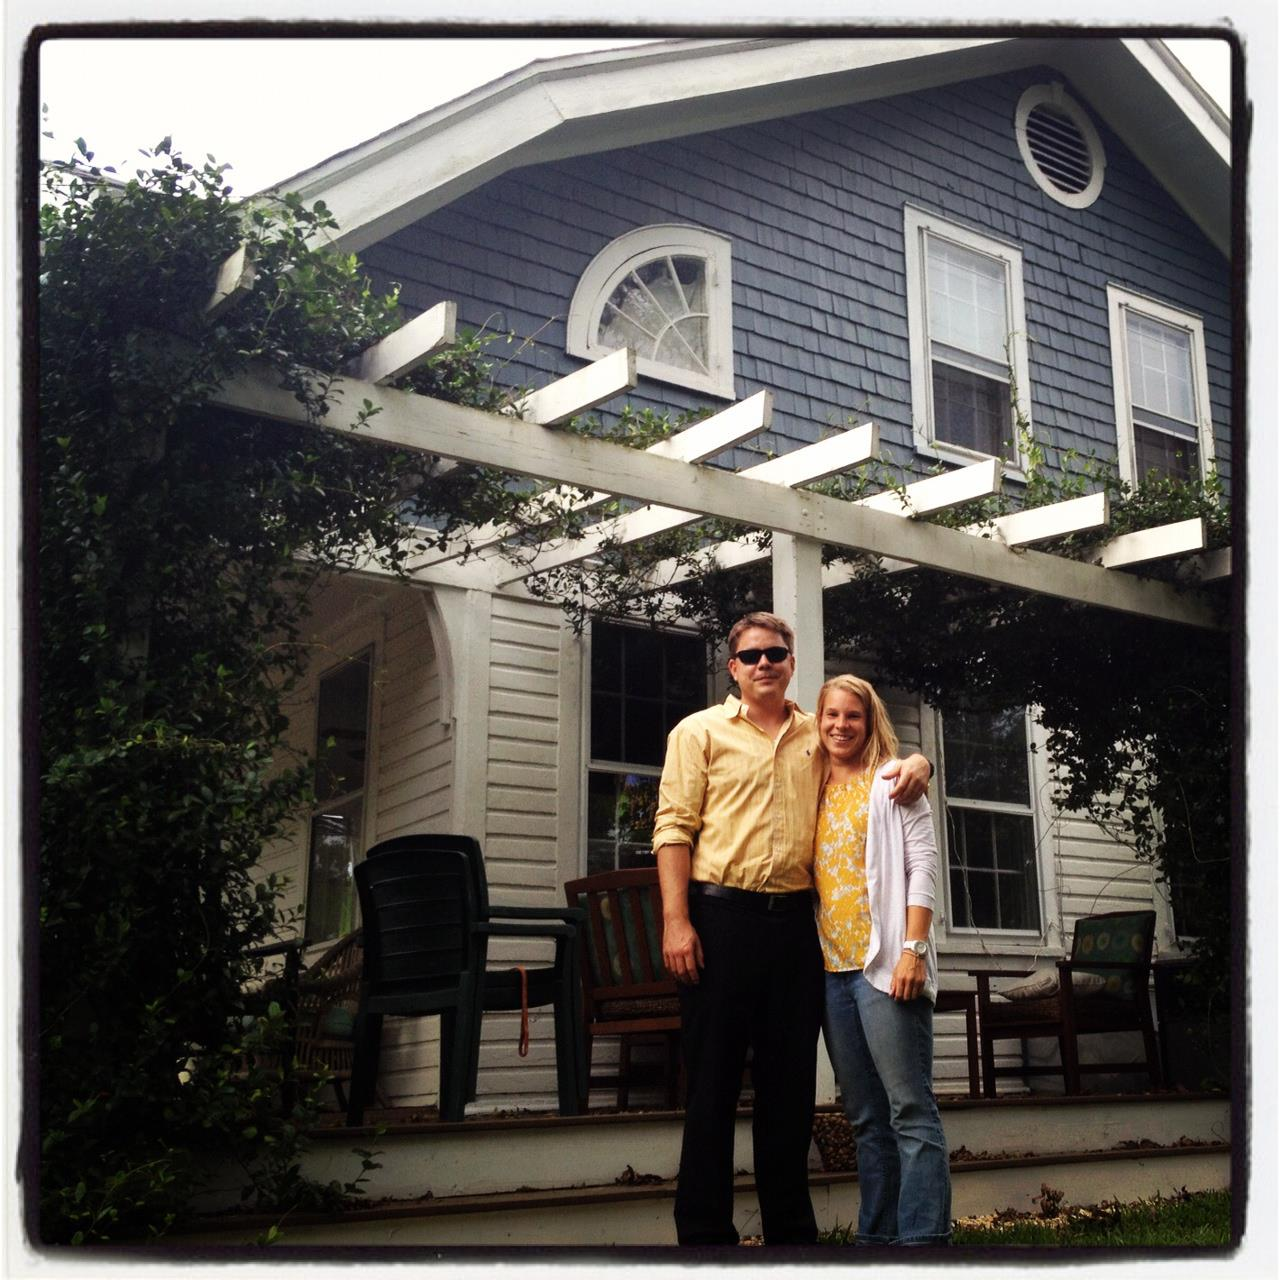 Shawn and Joesephine Halsor - Wagener Terrace